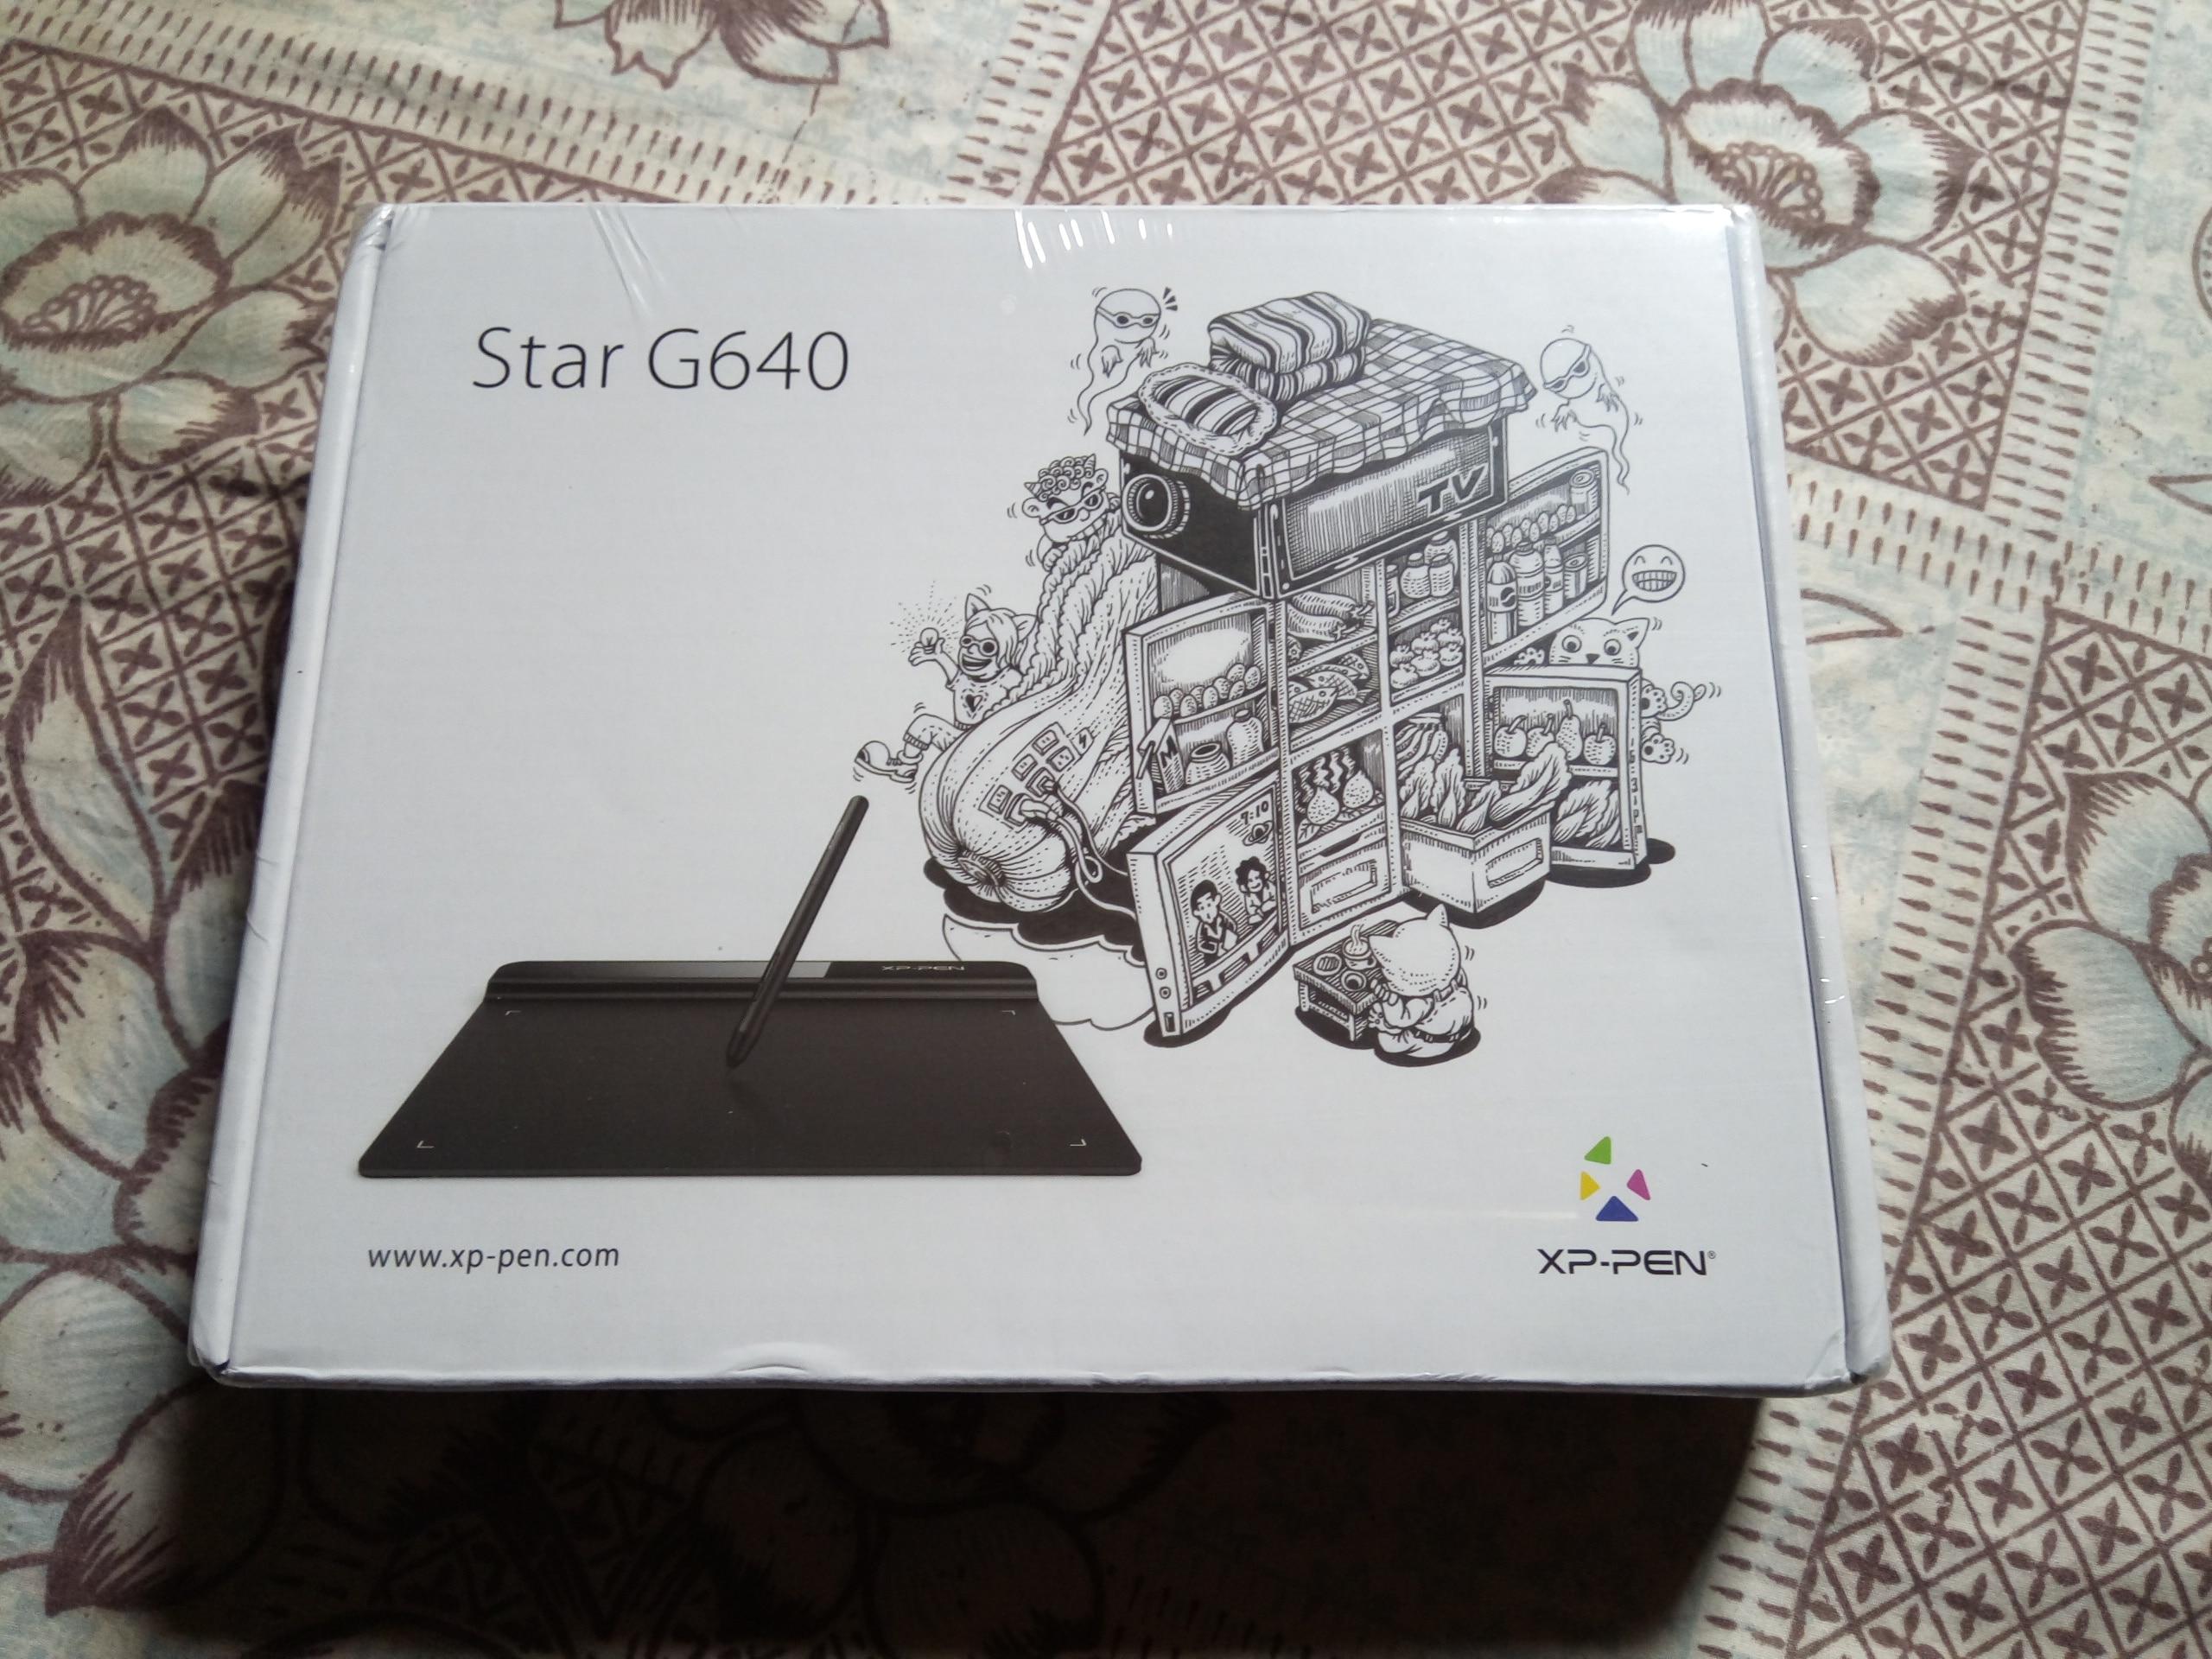 XP Pen Bintang G640 Tablet Grafis Digital Tabletgrafik Monitor Tablet Untuk Osu Dan Menggambar 8192 Tingkat Tekanan 266RPS